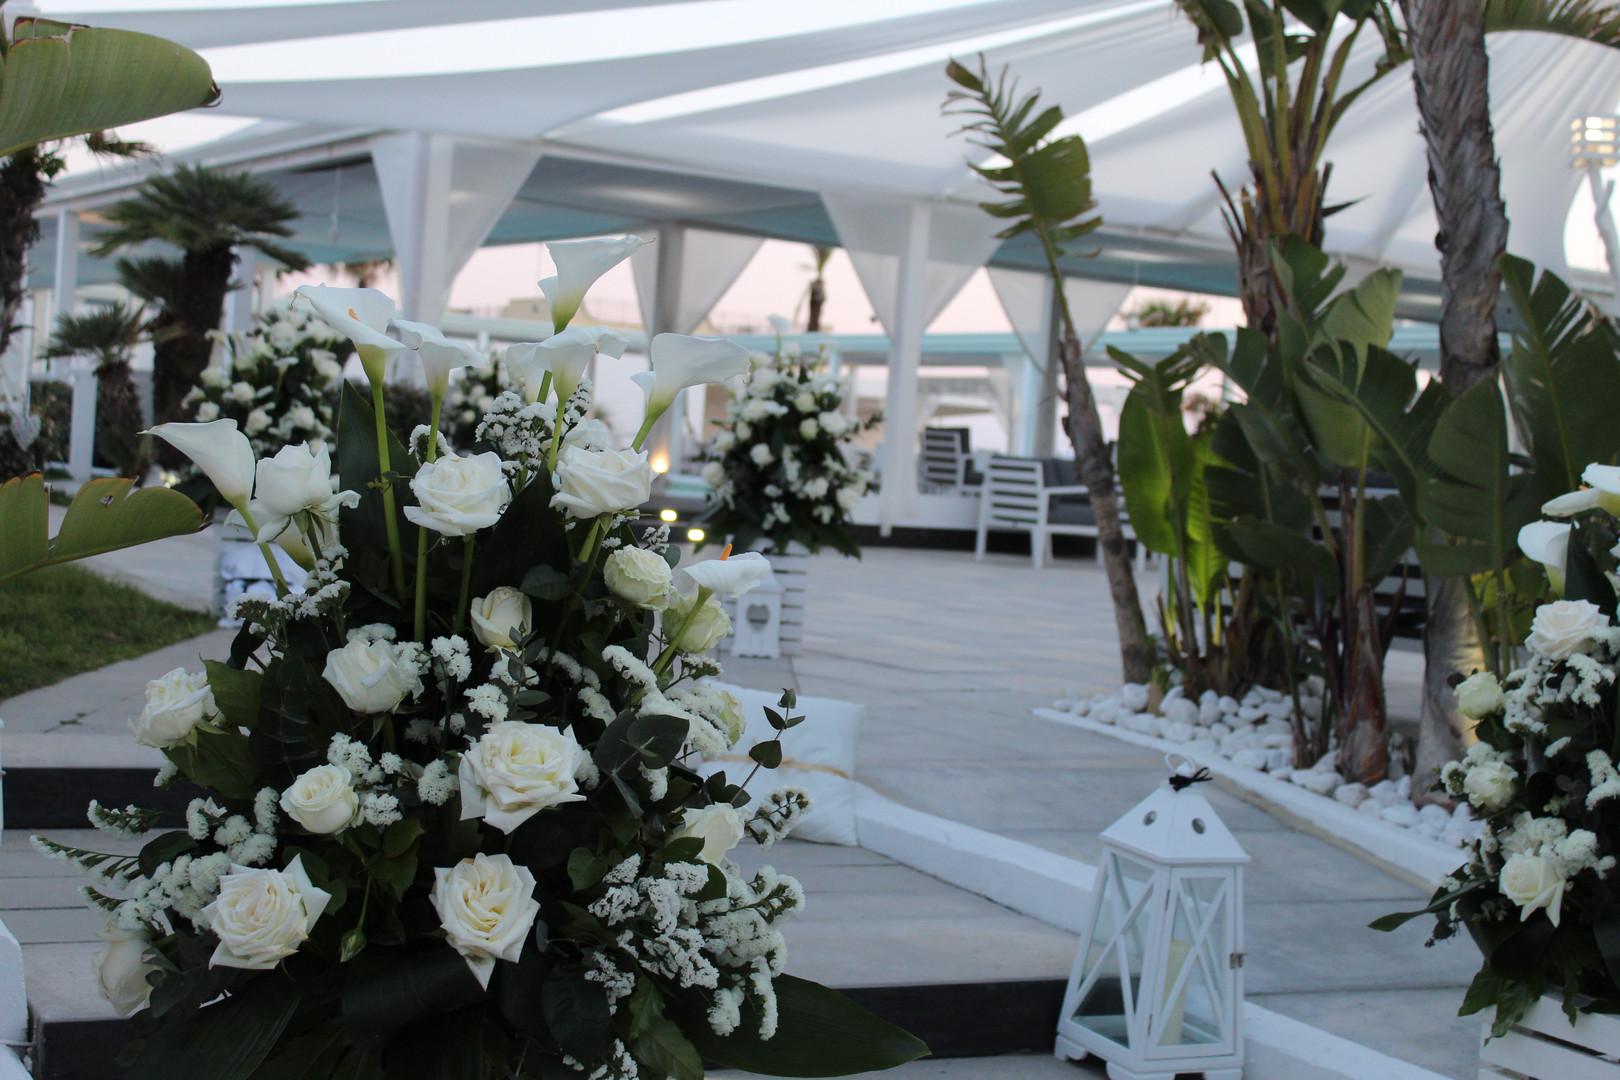 Matrimonio in spiaggia napoli.JPG